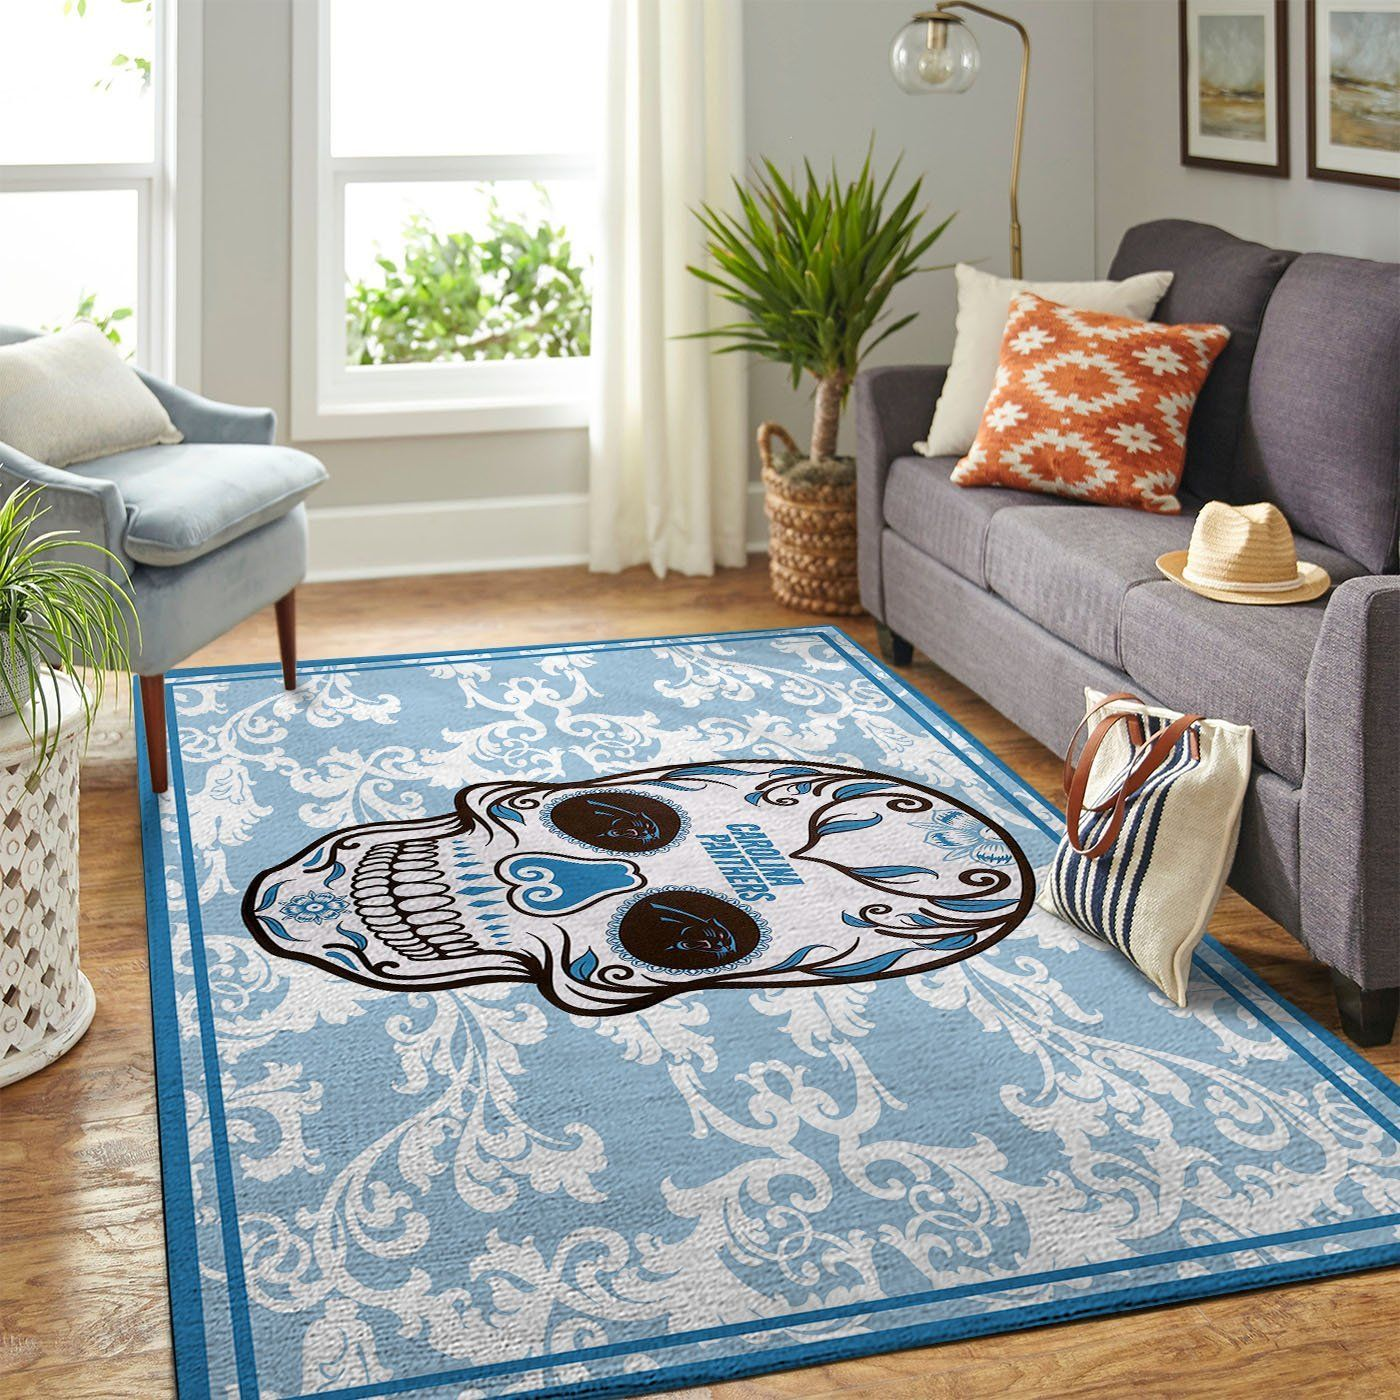 Amazon Carolina Panthers Living Room Area No2378 Rug